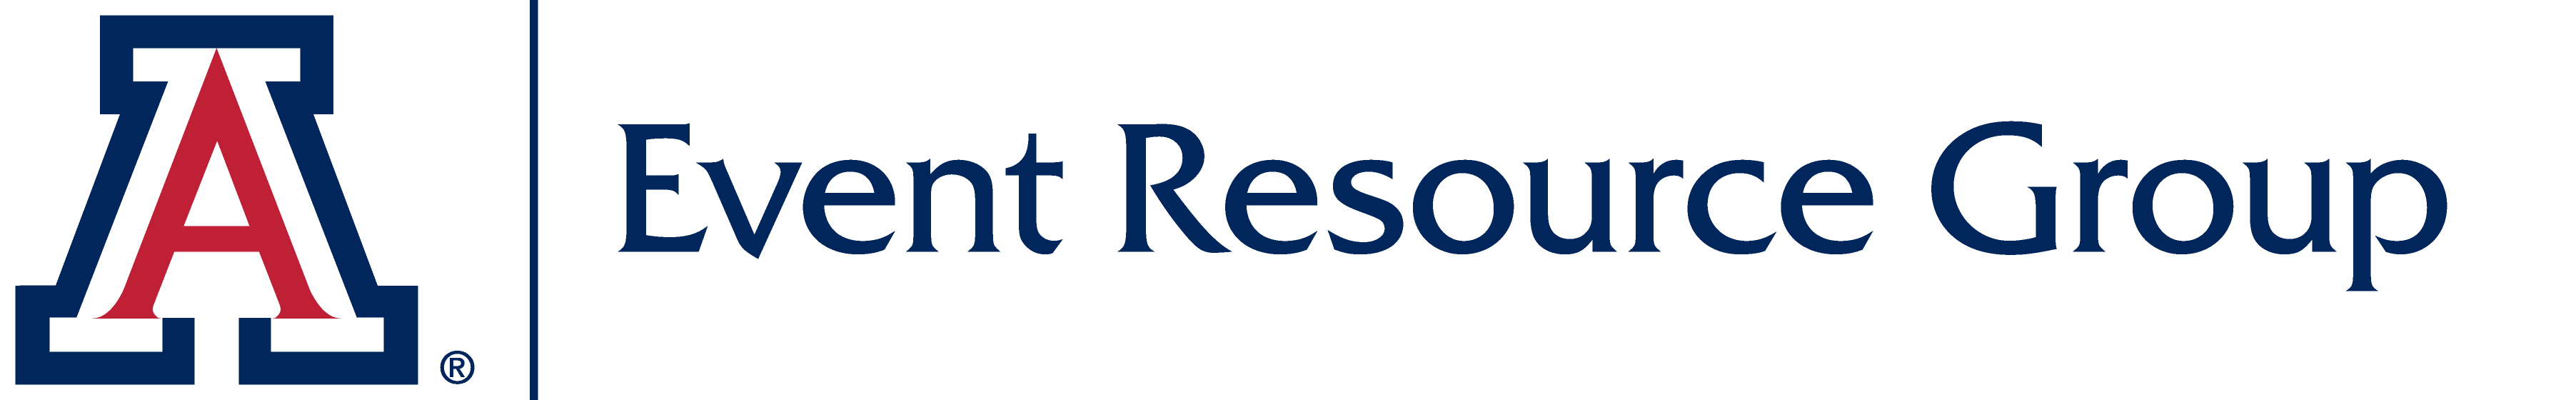 UA Event Resource Group | Home